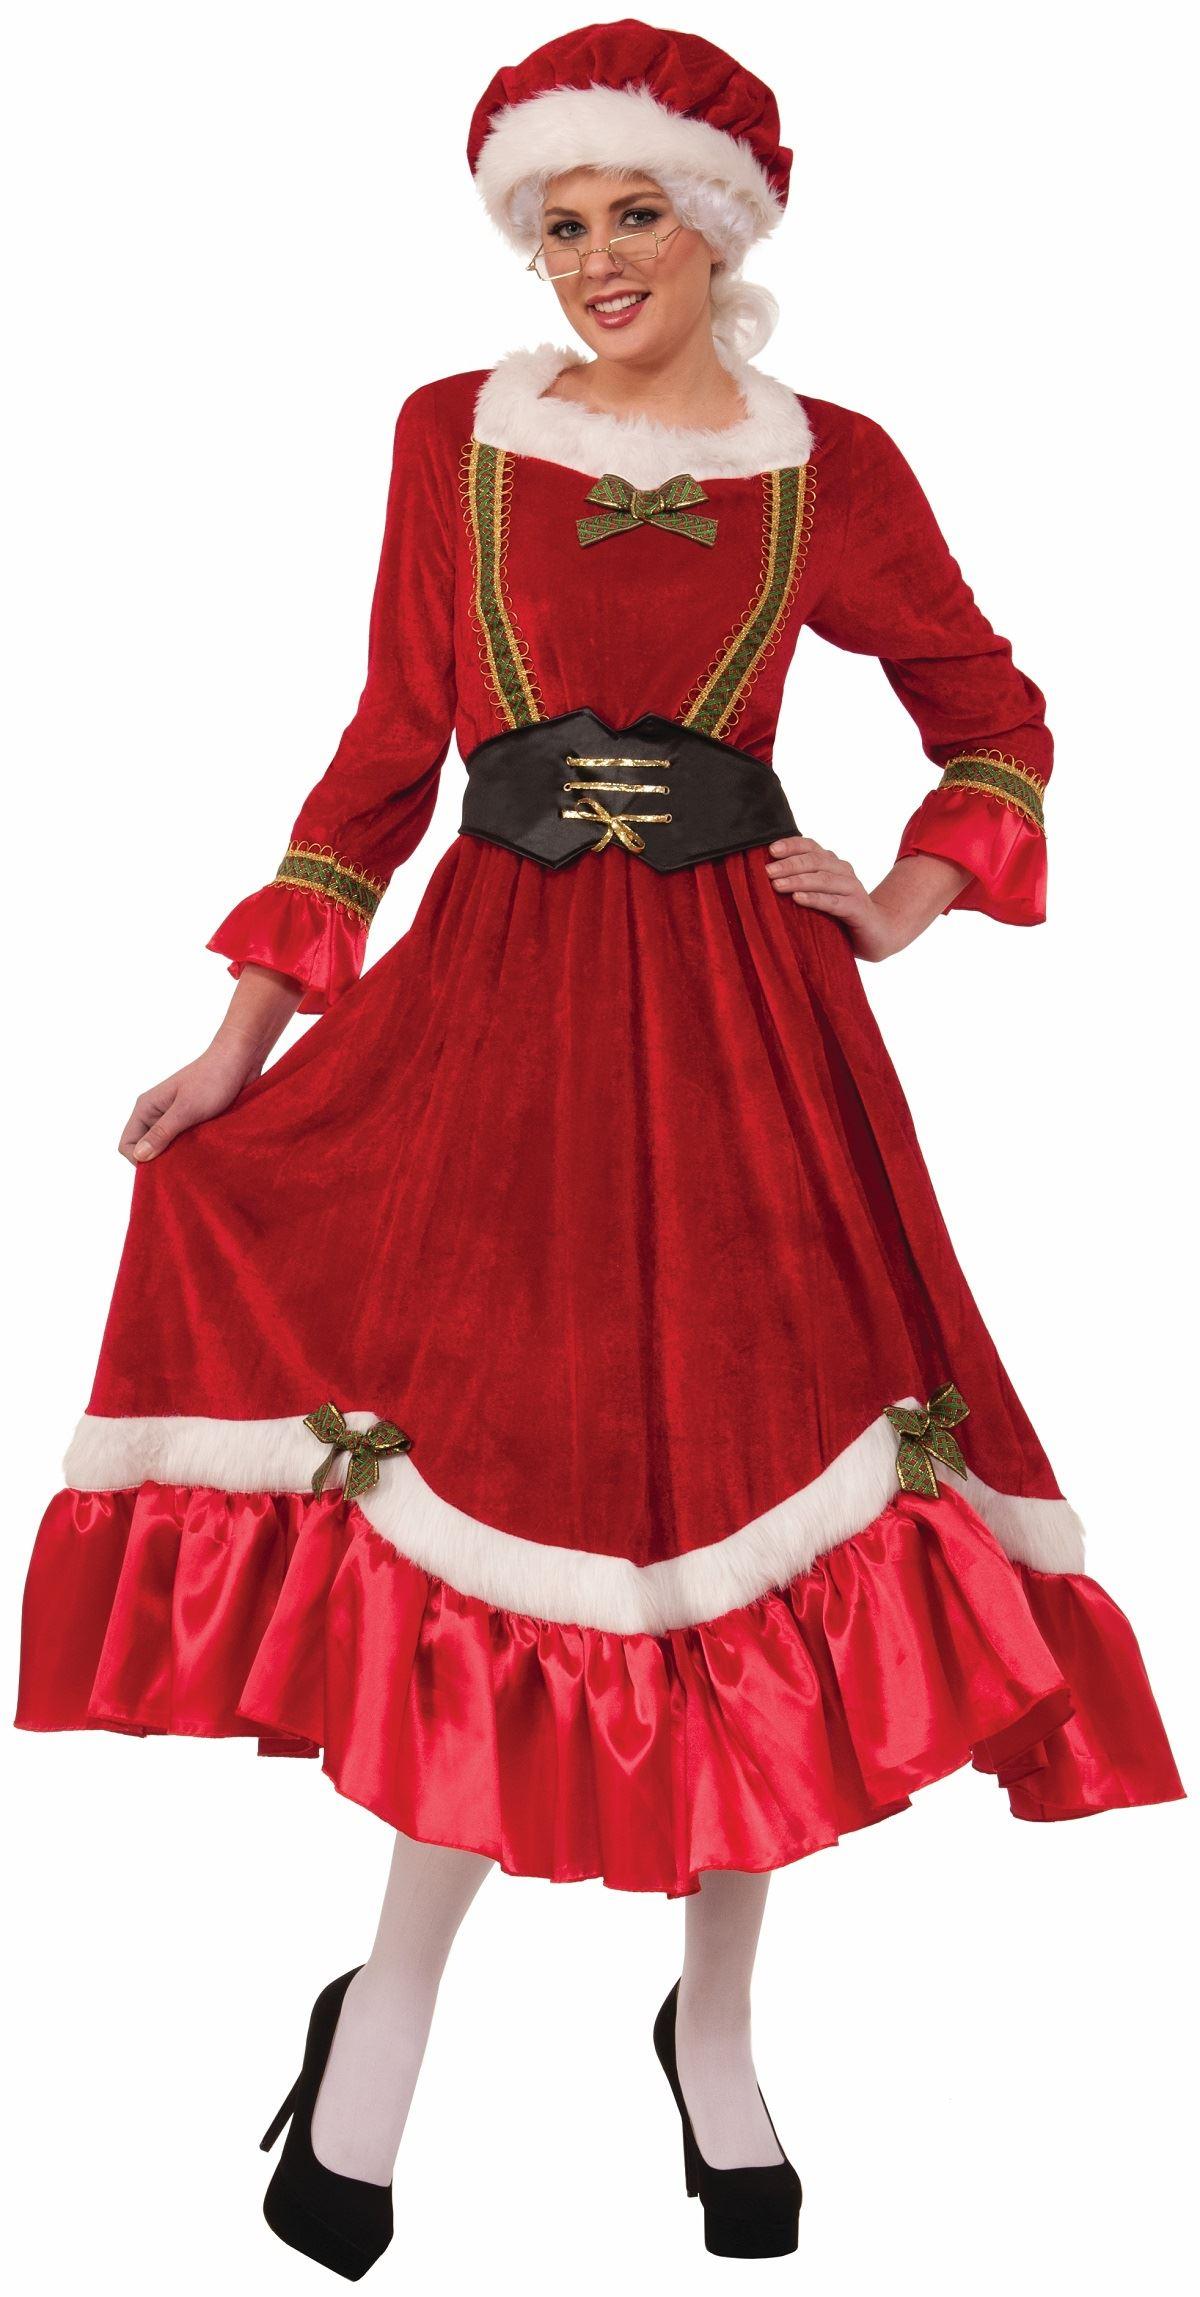 Claus woman christmas halloween costume 40 99 the costume land